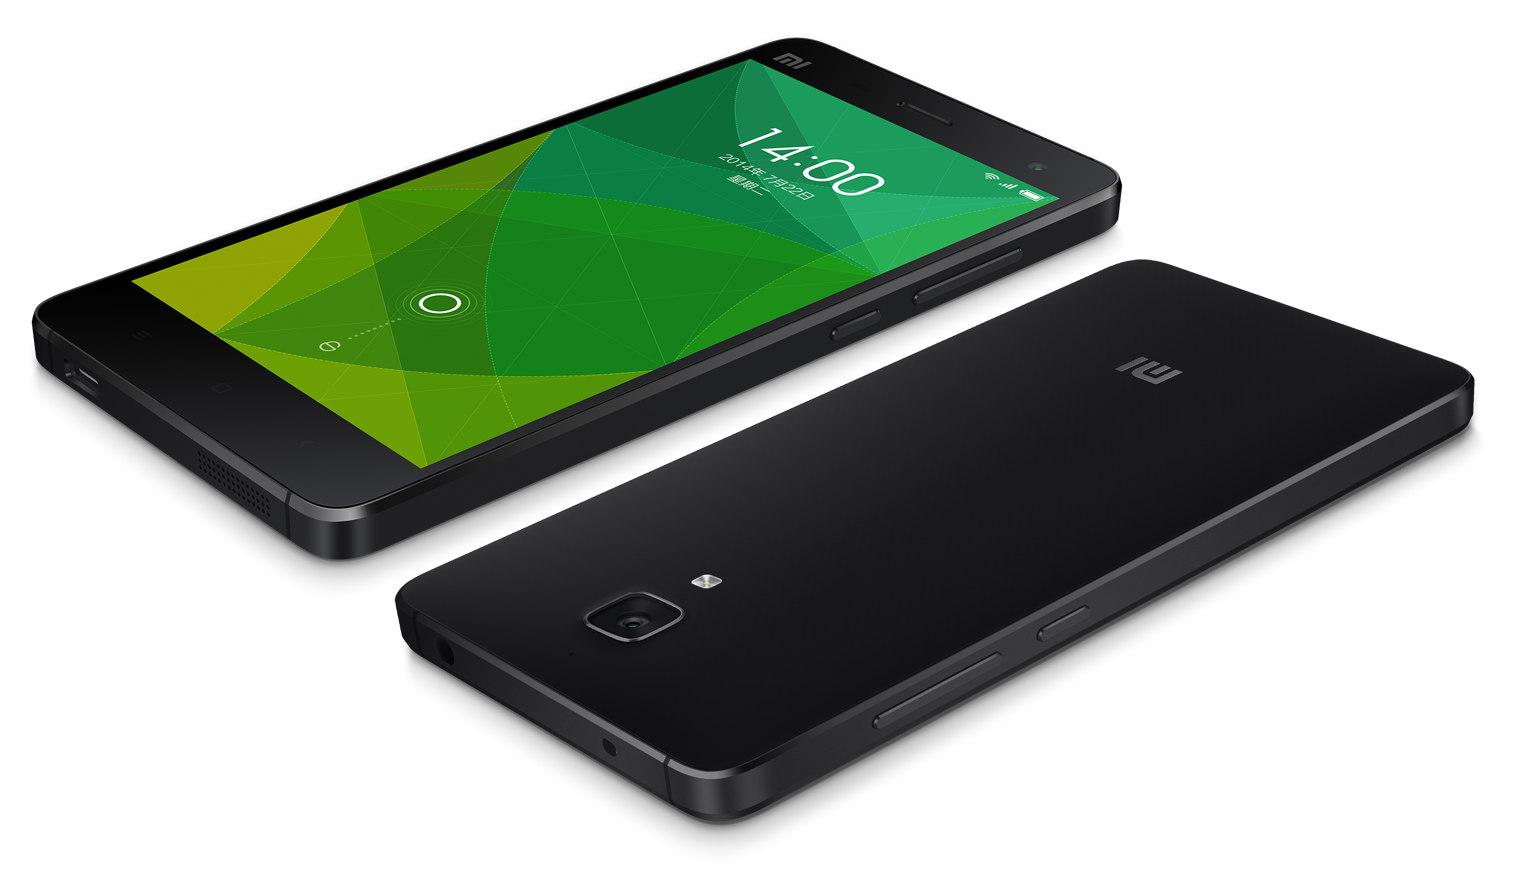 Xiaomi Mi4 benchmark